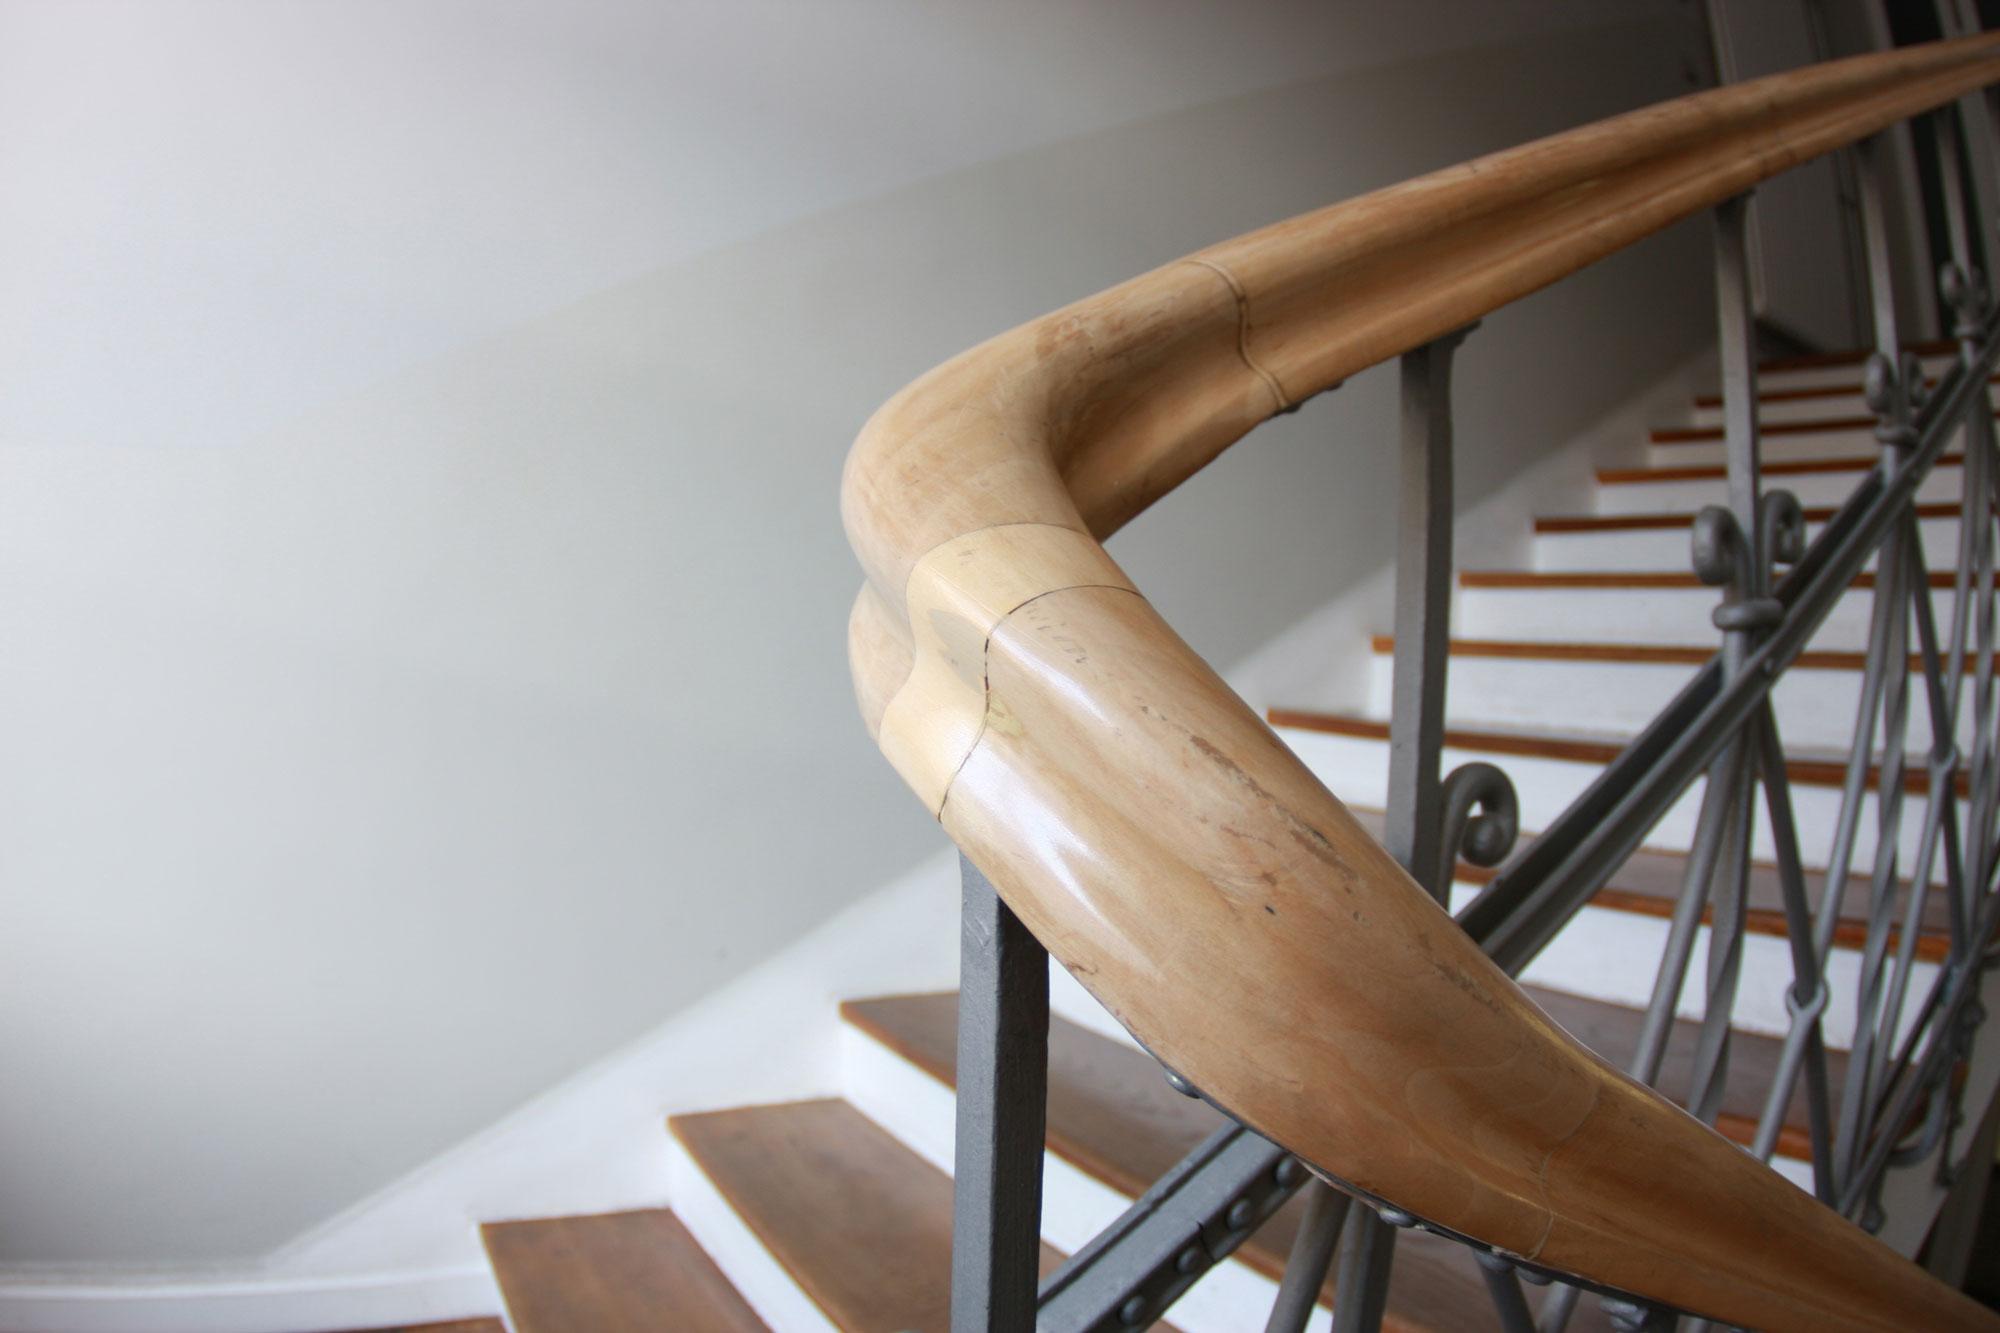 1-10-Treppenaufbau/Handlauf